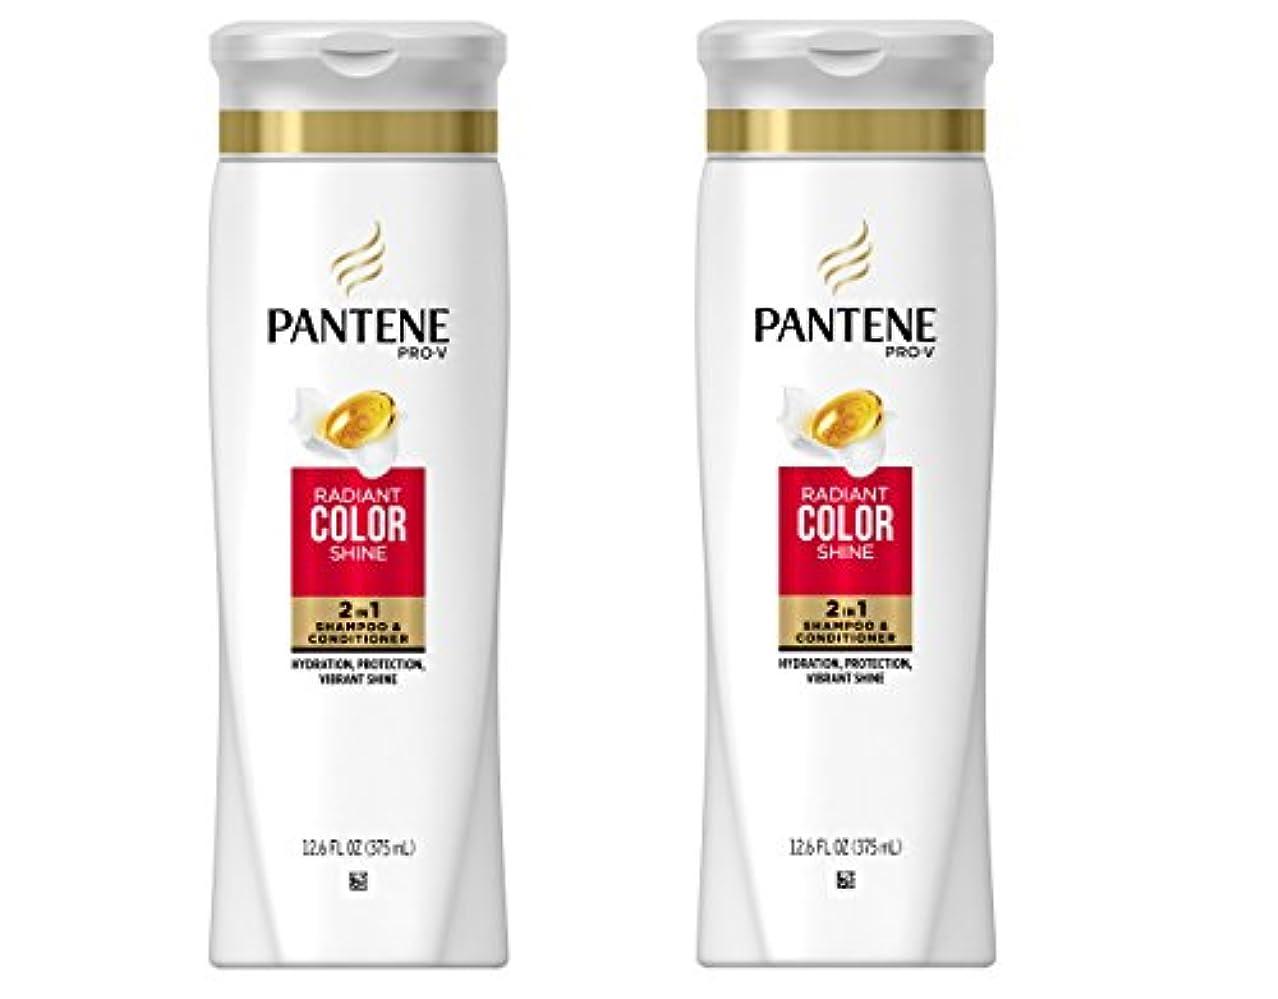 Pantene プロVラディアン色鮮やかな輝きを放つドリームケアの2in1シャンプー&コンディショナーシャイン12.6オズ(2パック) 12.6オンス(2パック) プロV色リバイバル磨きの2in1シャンプーとコンディショナー